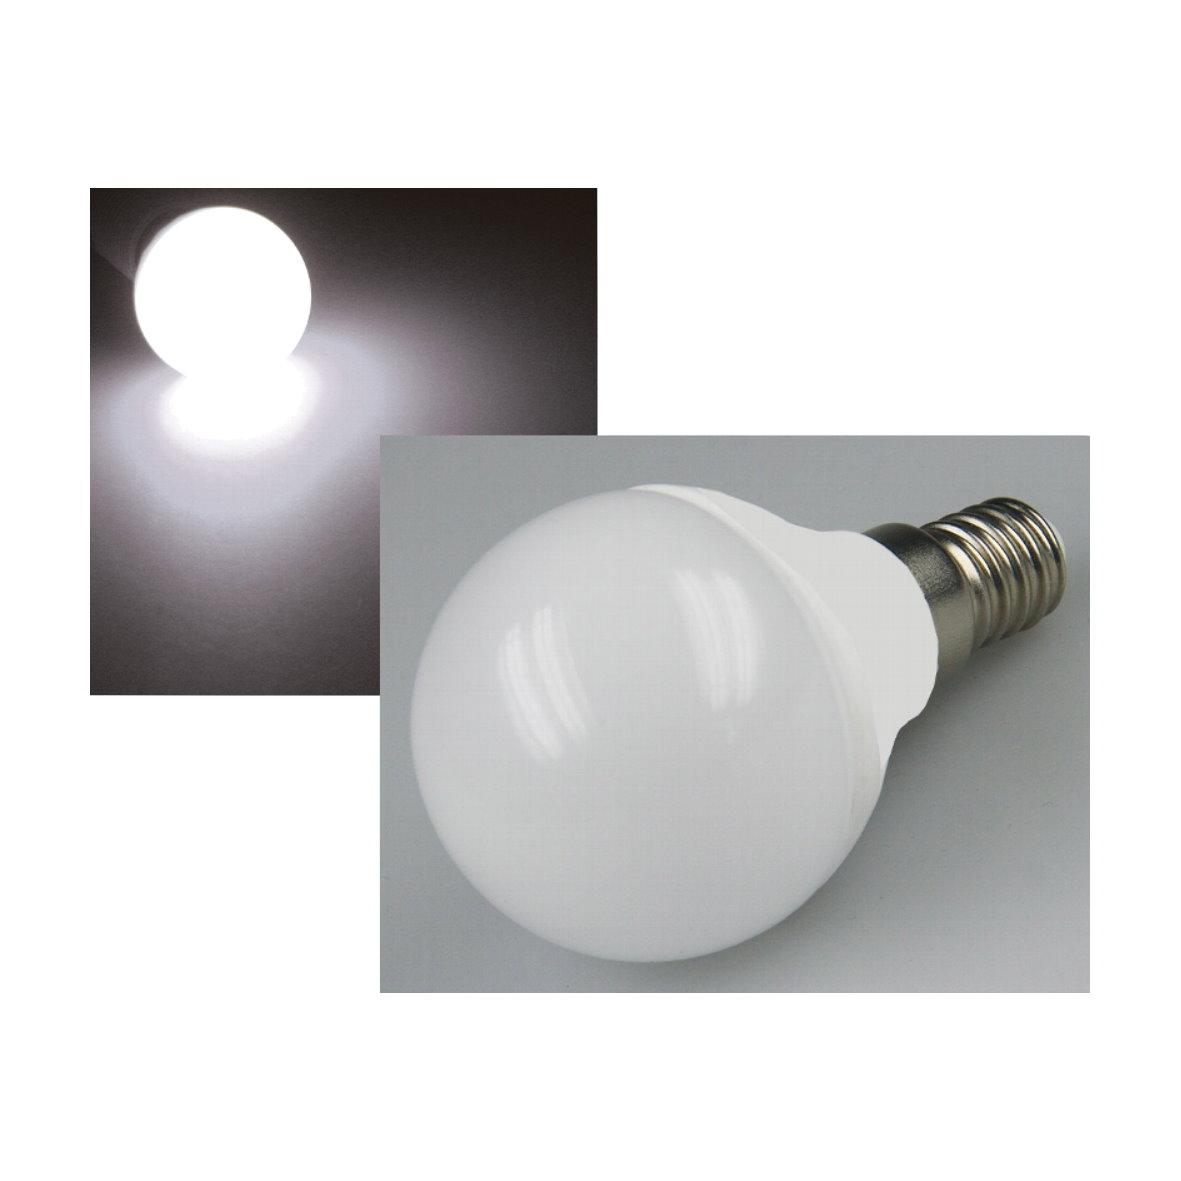 led smd leuchtmittel globe spot birne lampe tropfen rund tropfenform 1w 3w 5w ebay. Black Bedroom Furniture Sets. Home Design Ideas